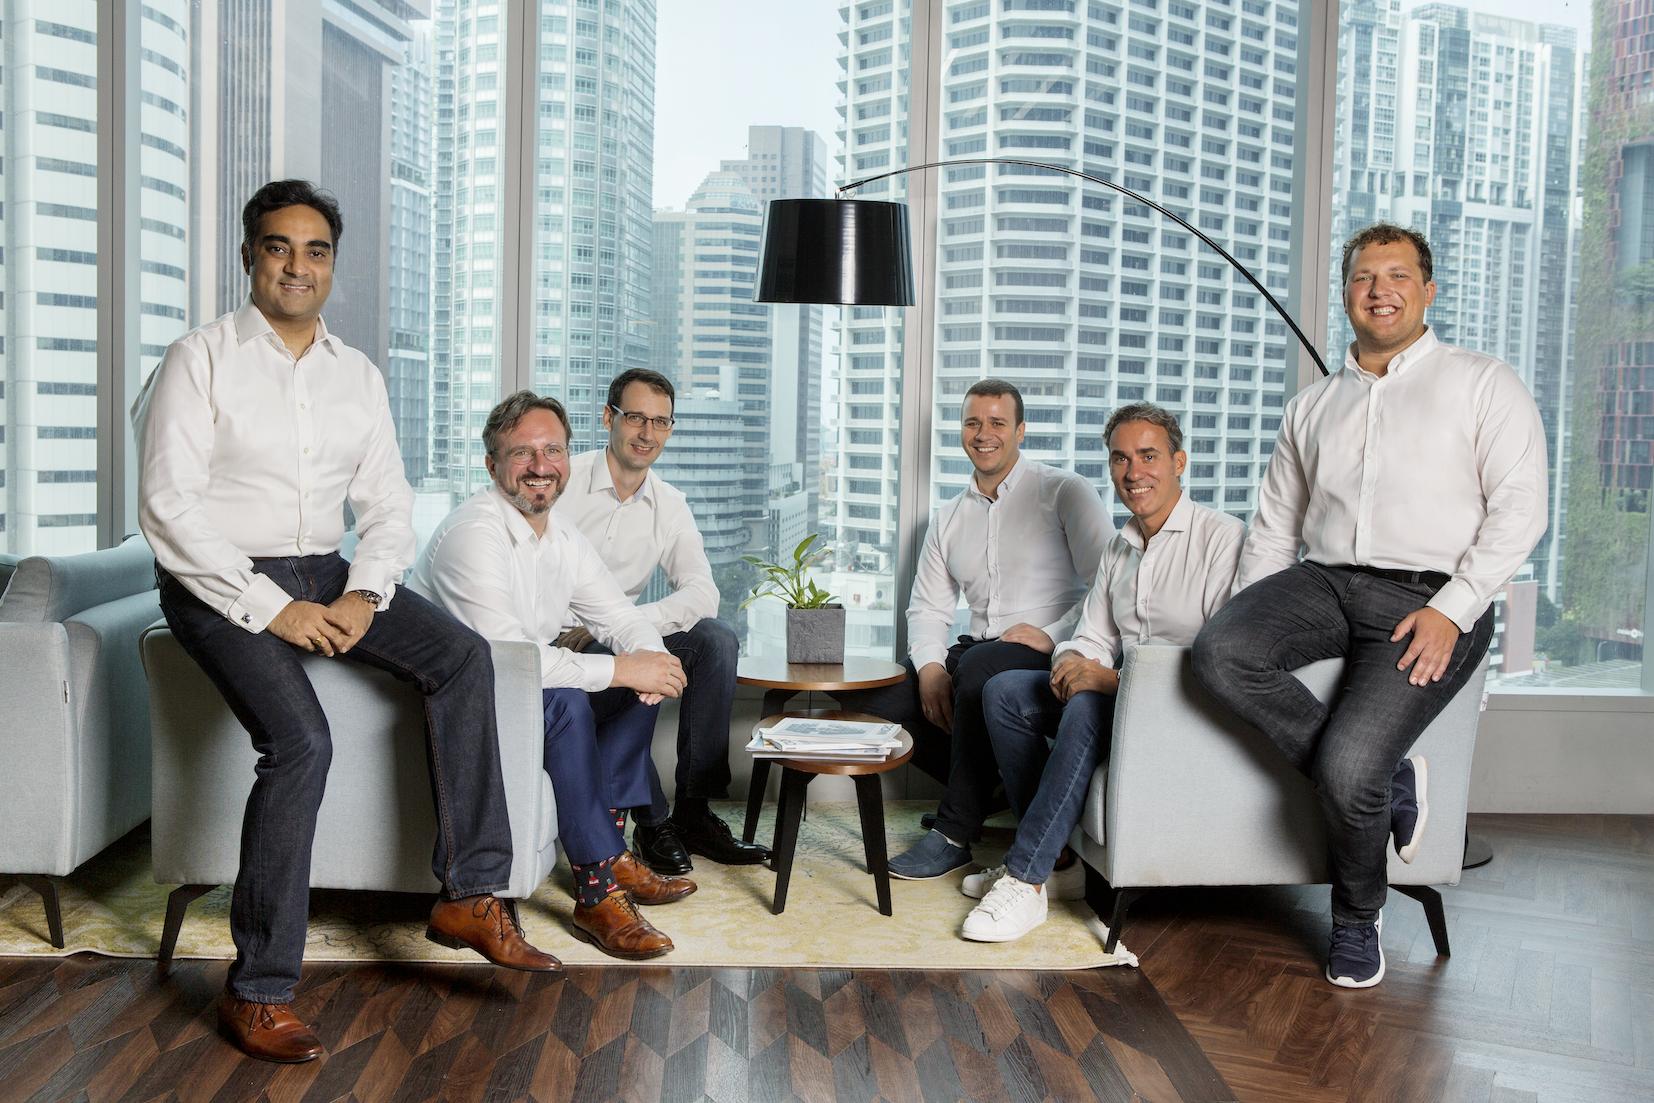 credolab raises 7 million in series a funding